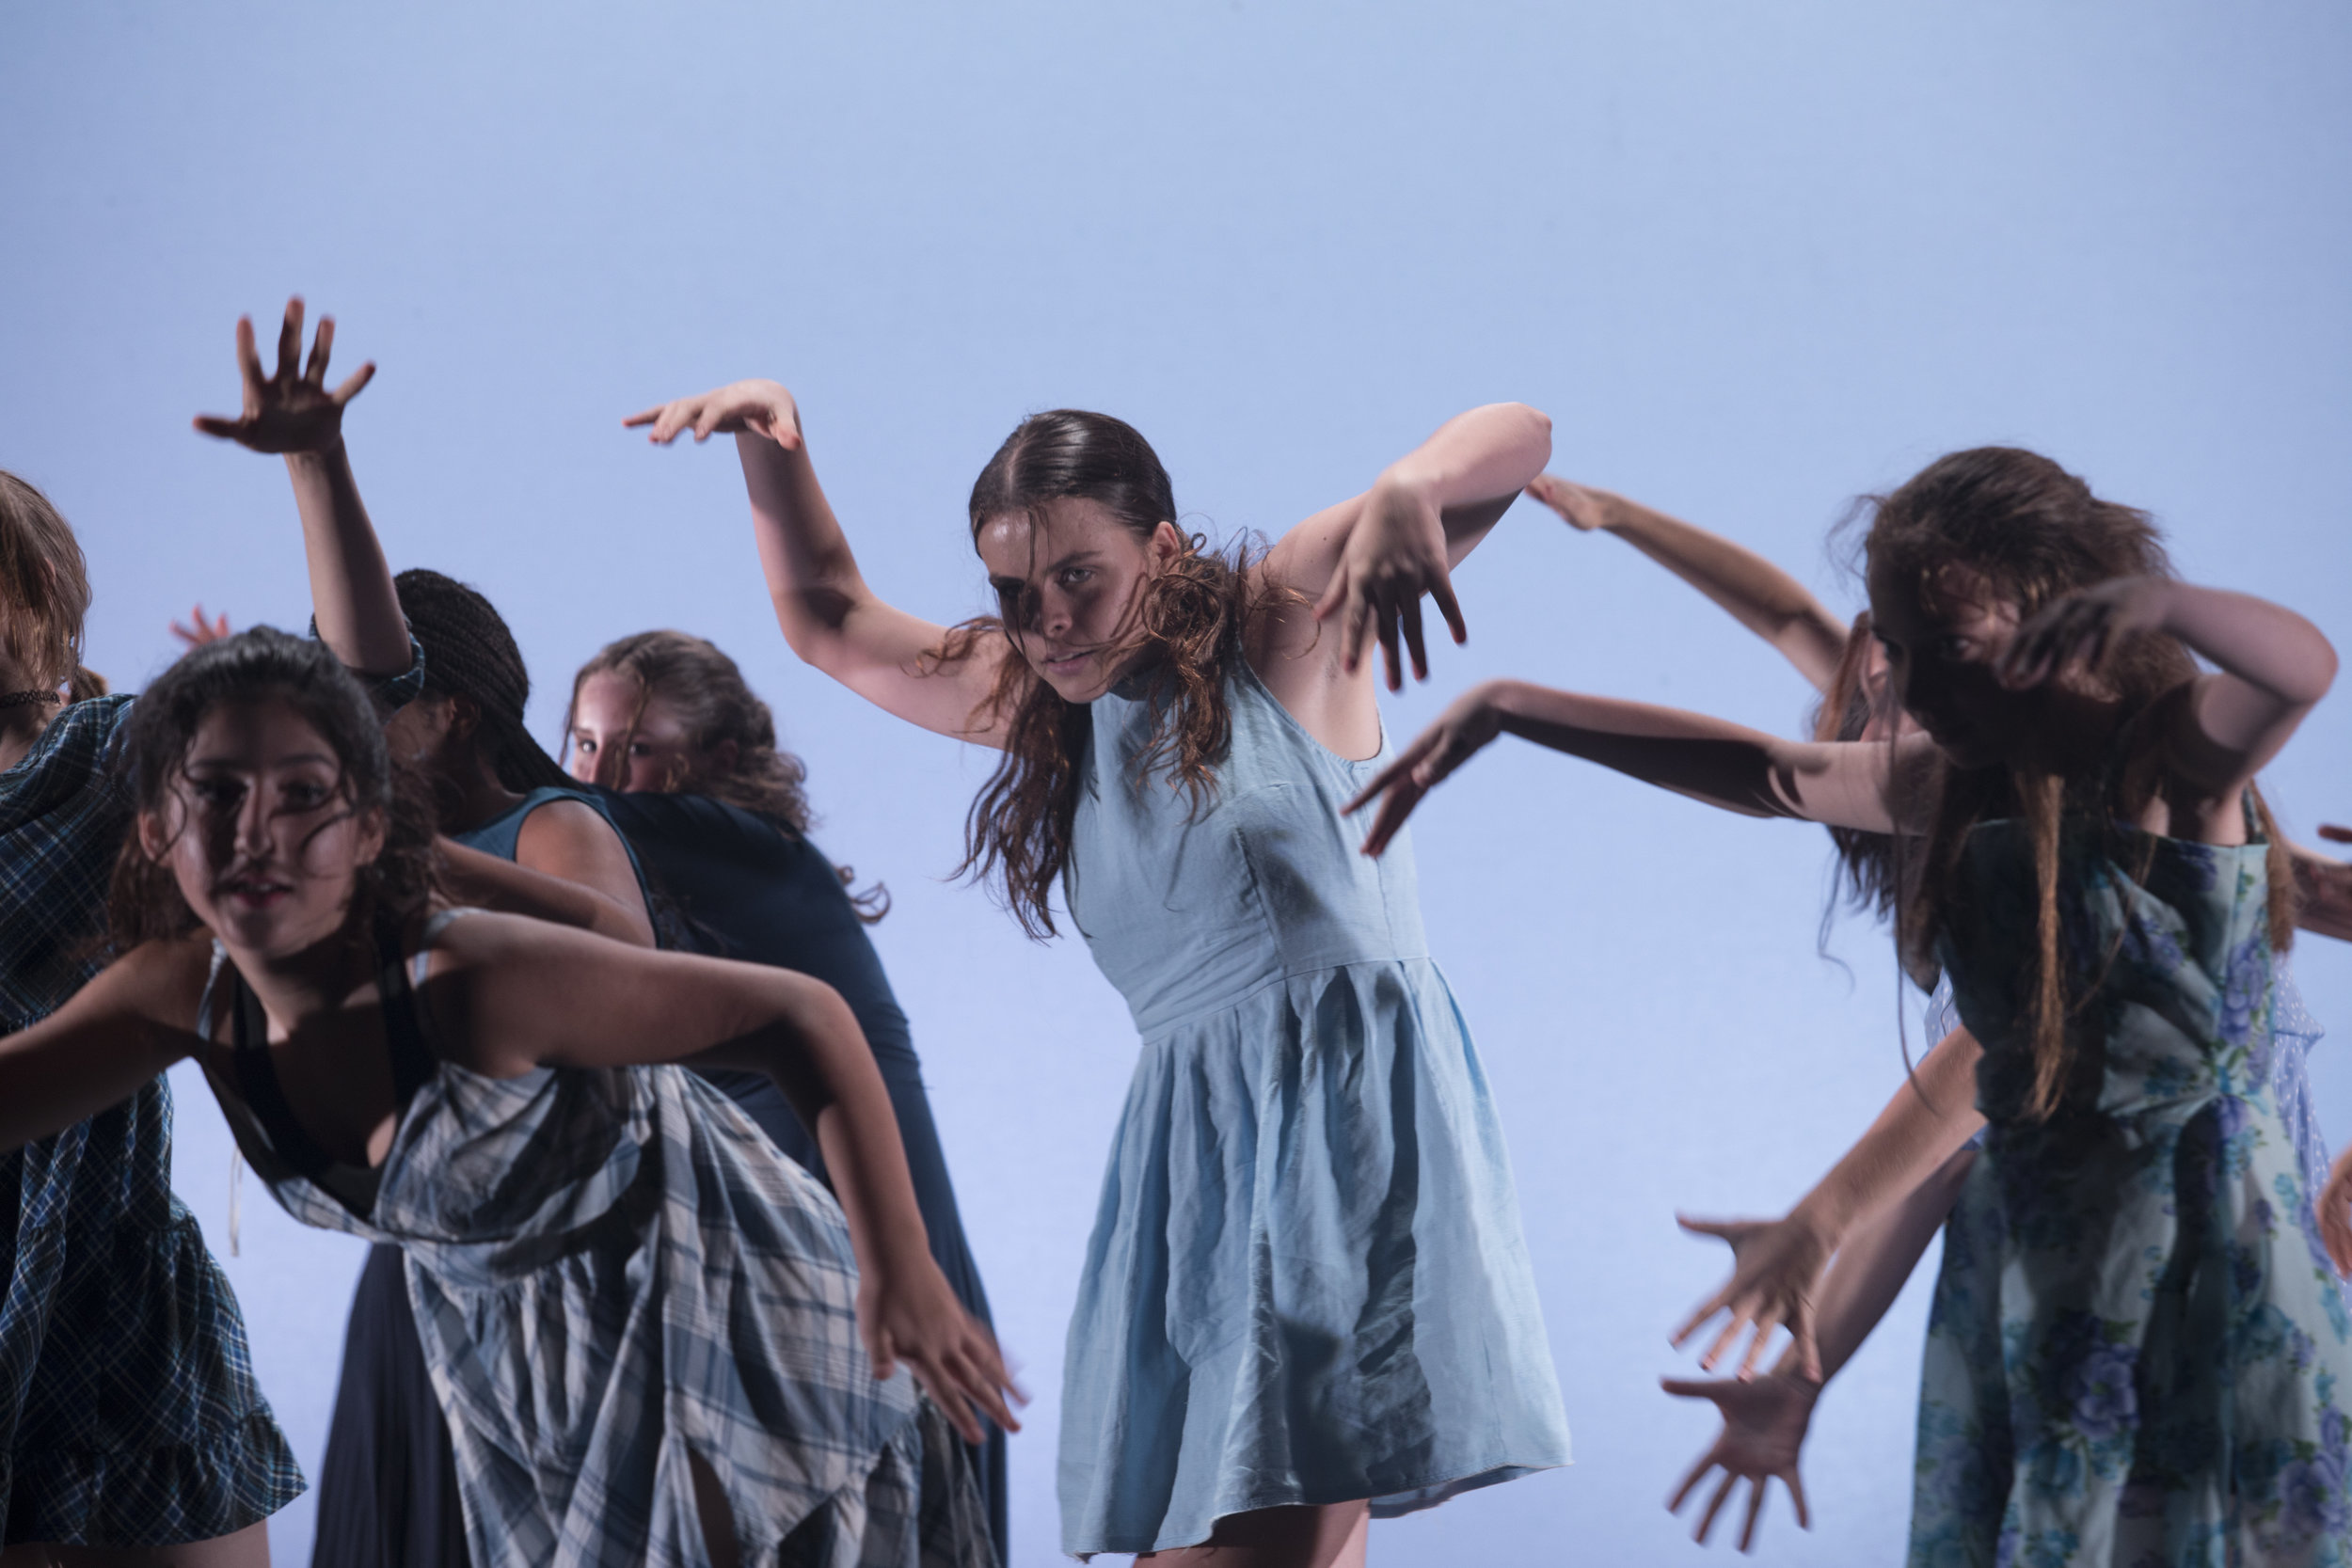 Dance Show by Jehanne-Marie Milne-38.jpg